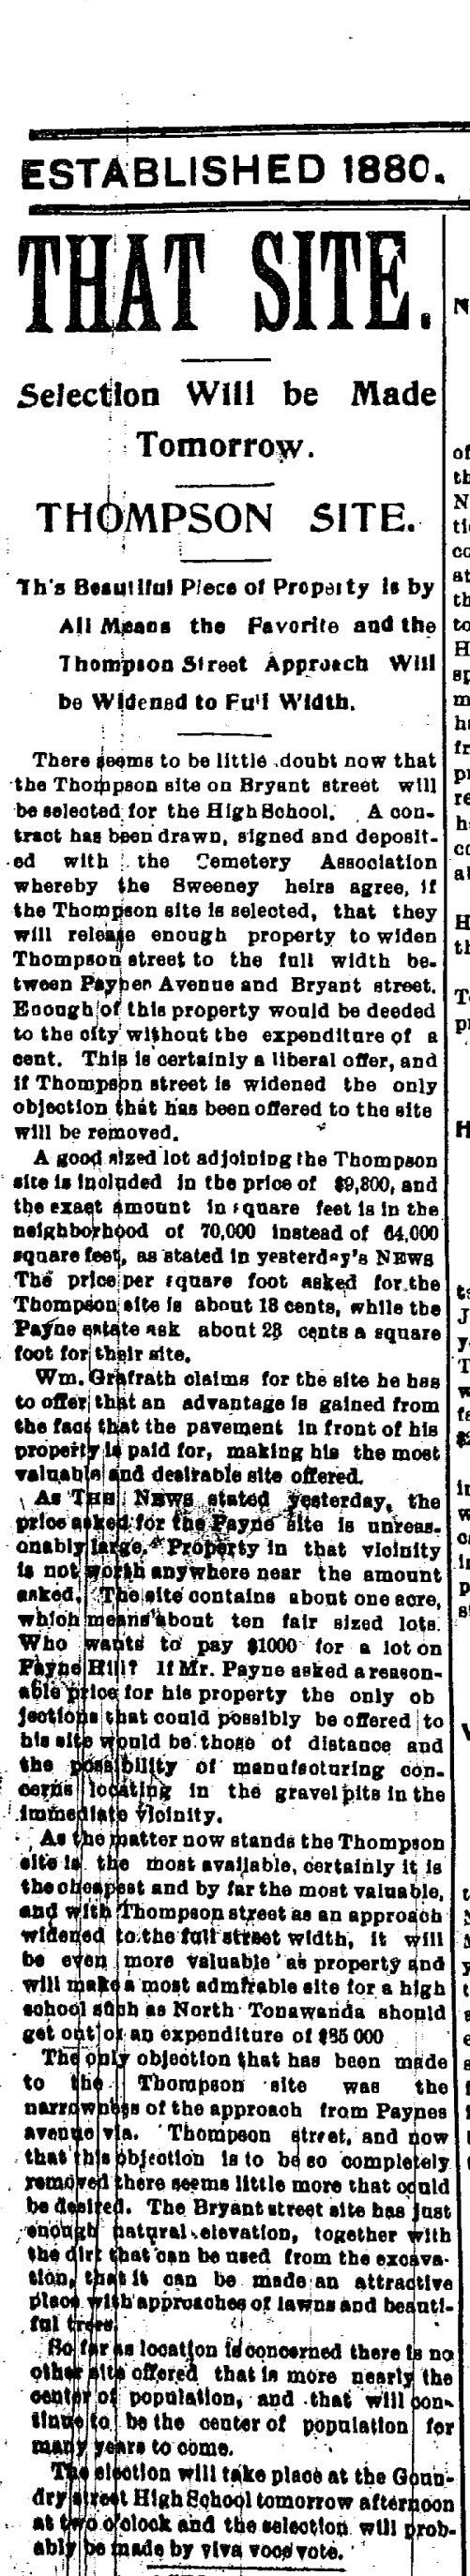 Thompson Site for New High School, article (Tonawanda News, 1900-01-05).jpg